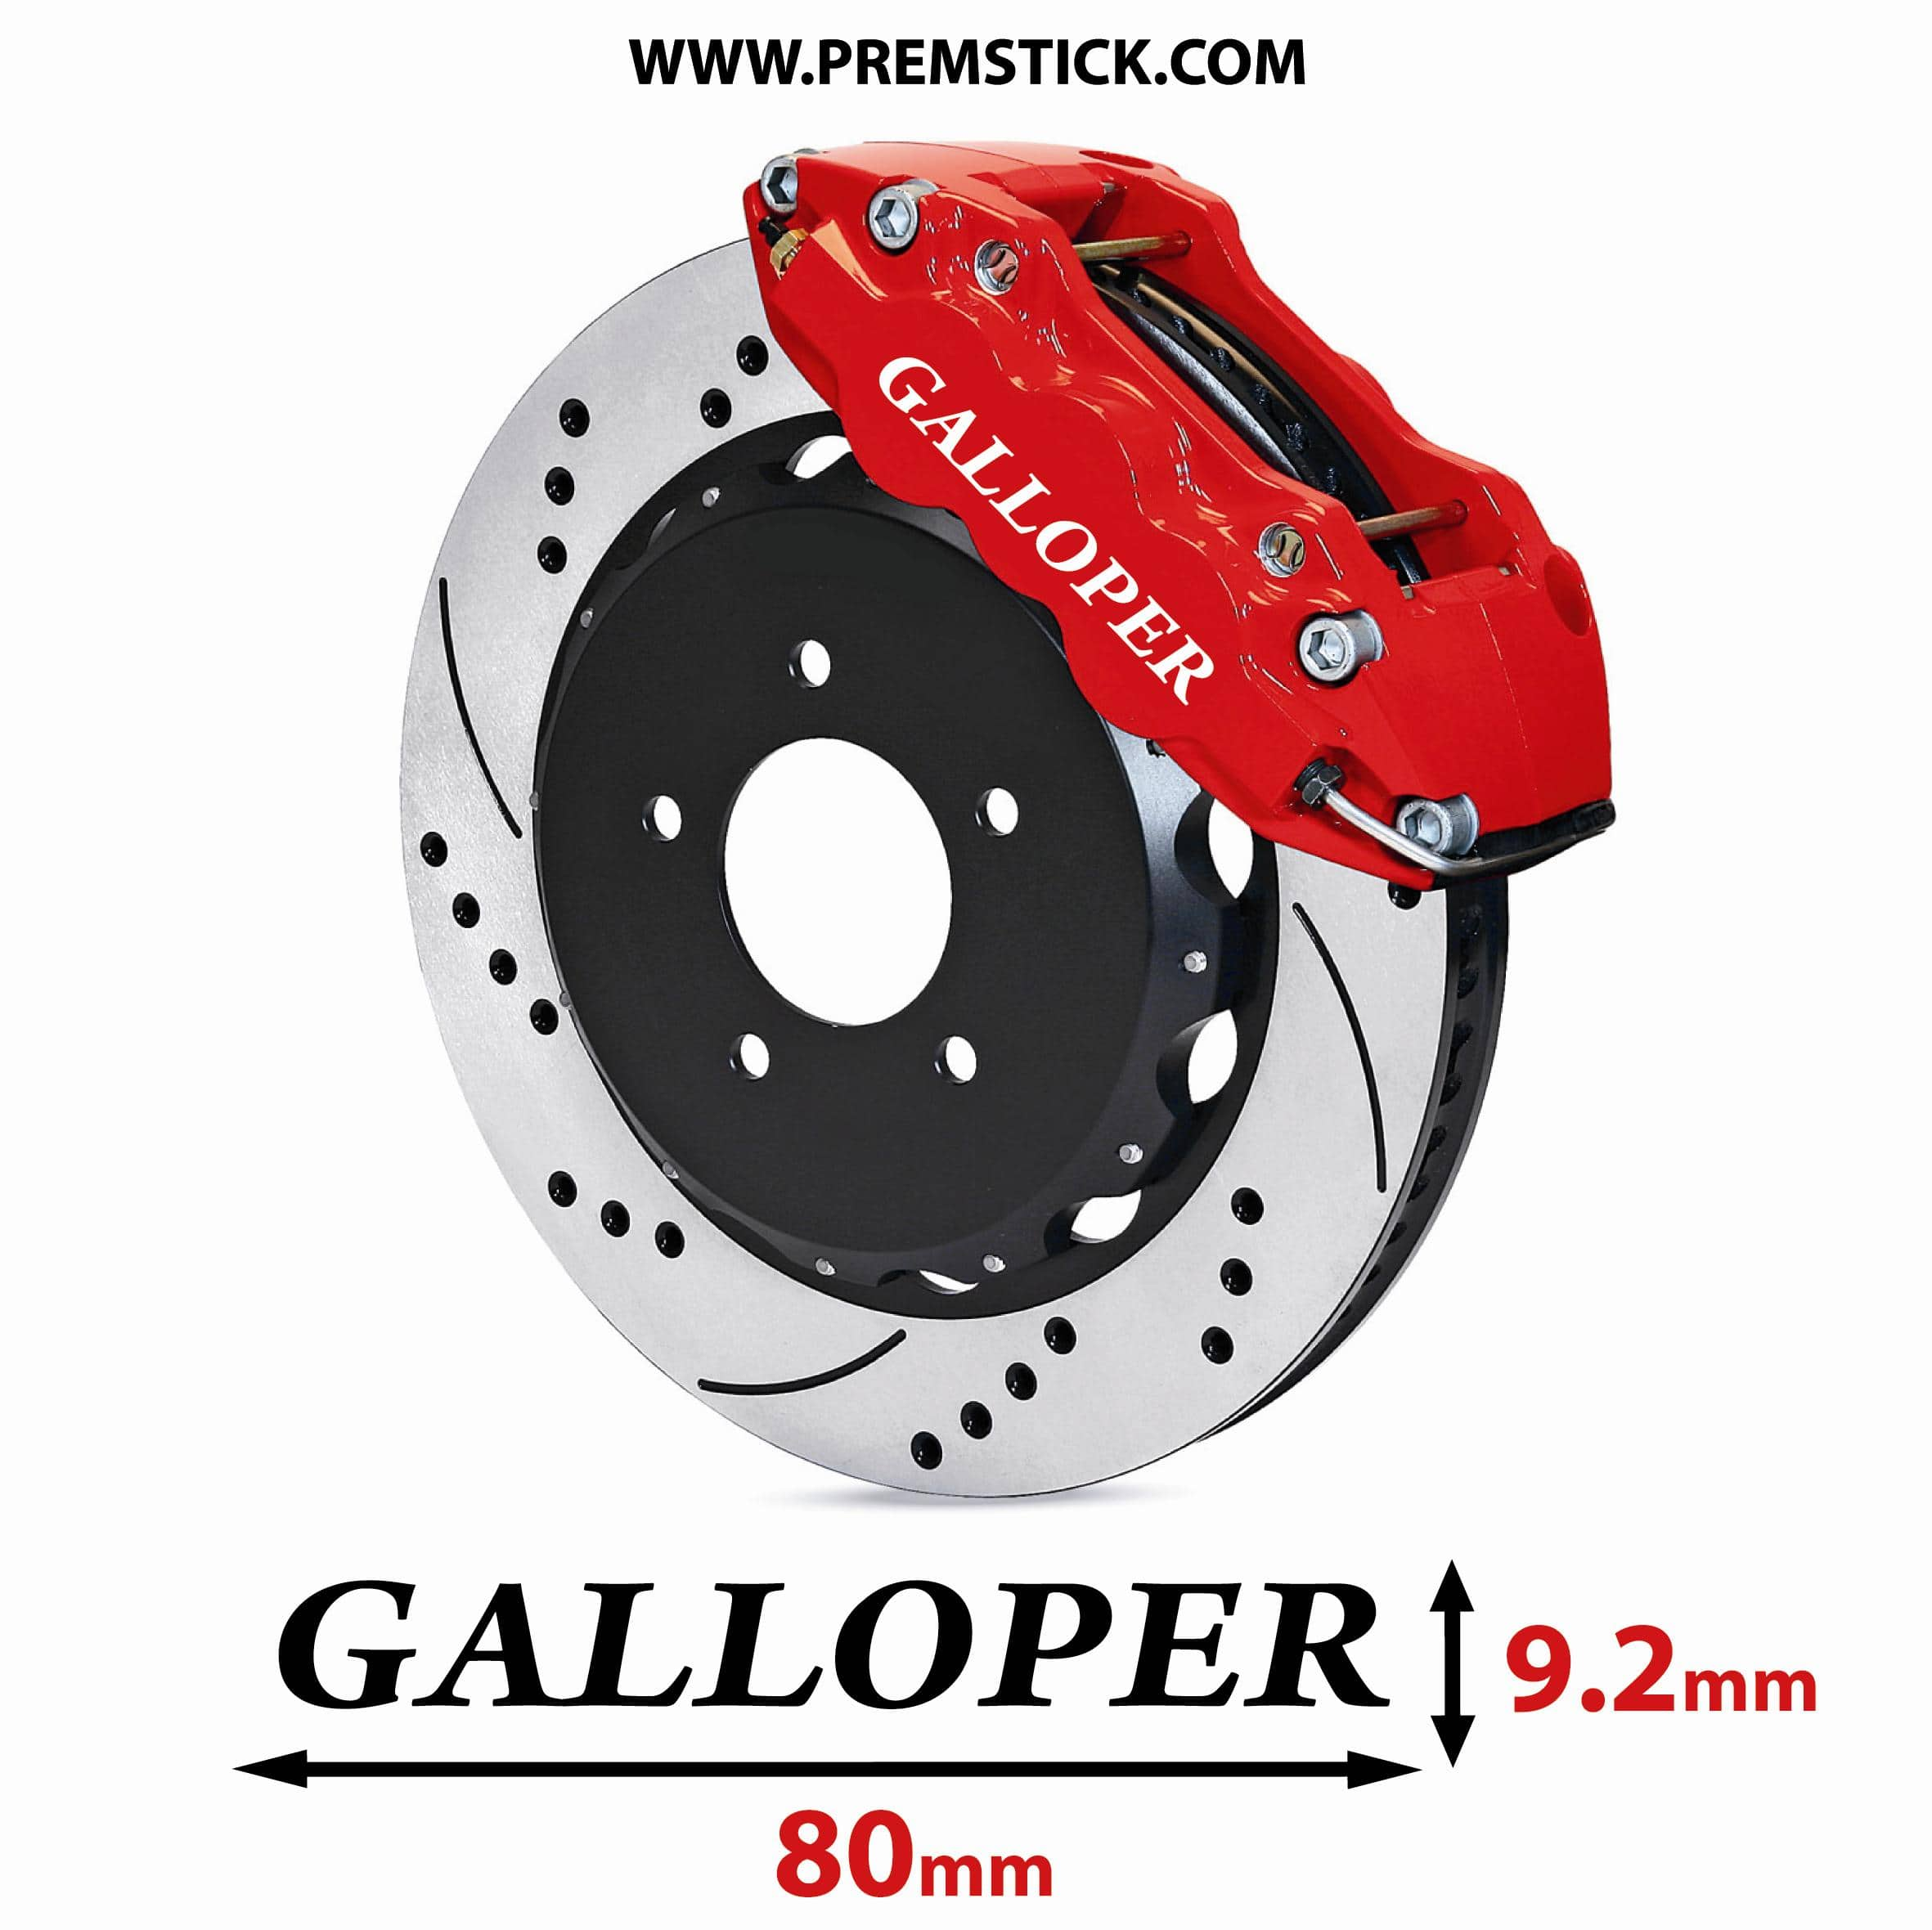 stickers-etrier-de-frein-galloper-hyundai-ref1-autocollant-etriers-freins-logo-voiture-sticker-adhesif-auto-car-disque-plaquette-pneu-jantes-racing-tuning-sponsors-sport-min